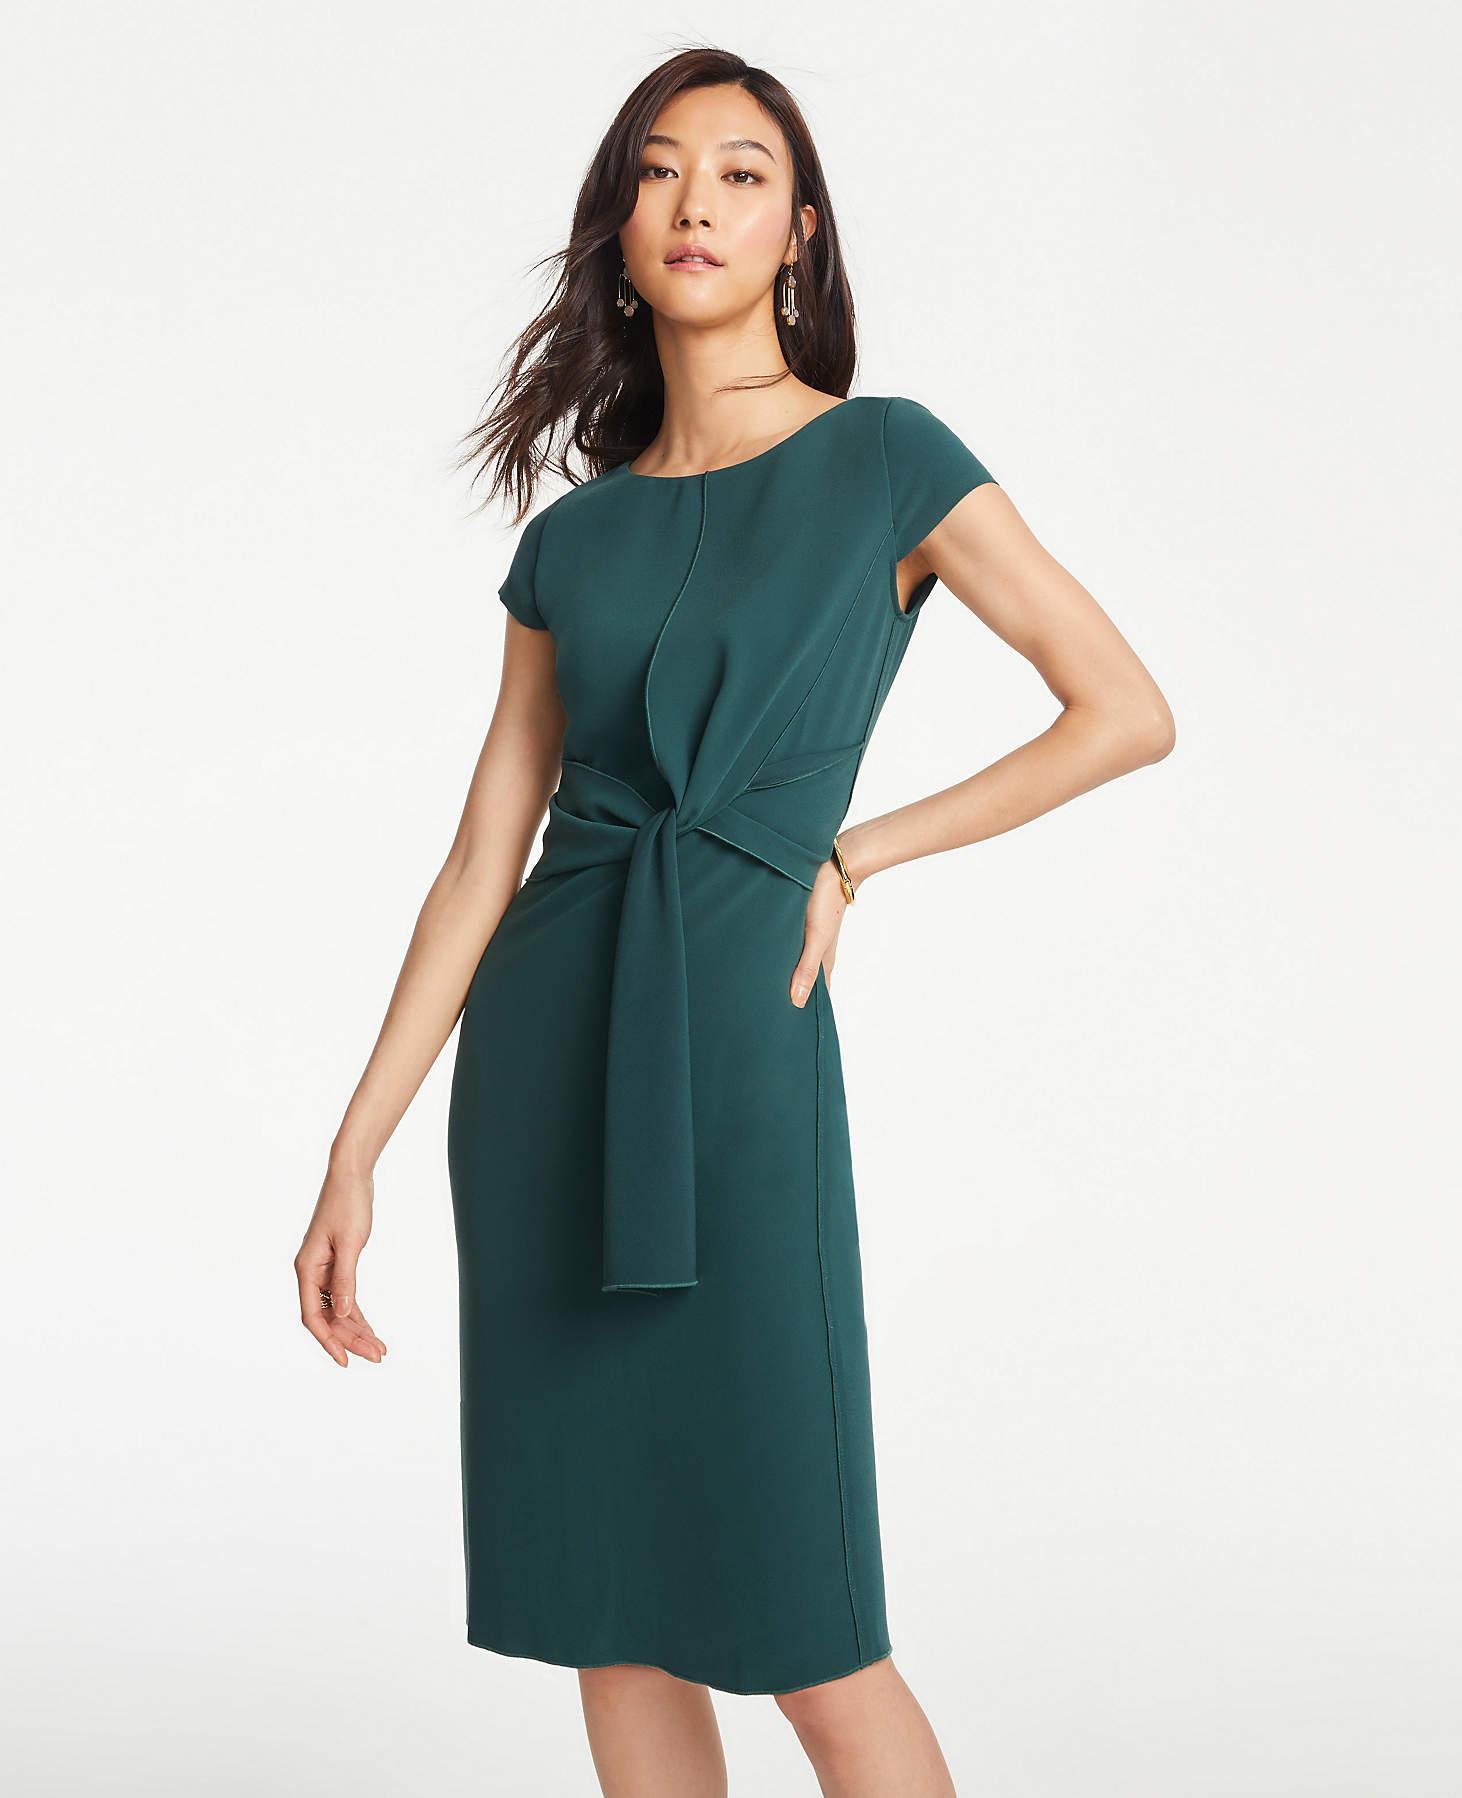 fb51652eb76 Lyst - Ann Taylor Petite Foldover Tie Waist Sheath Dress in Green